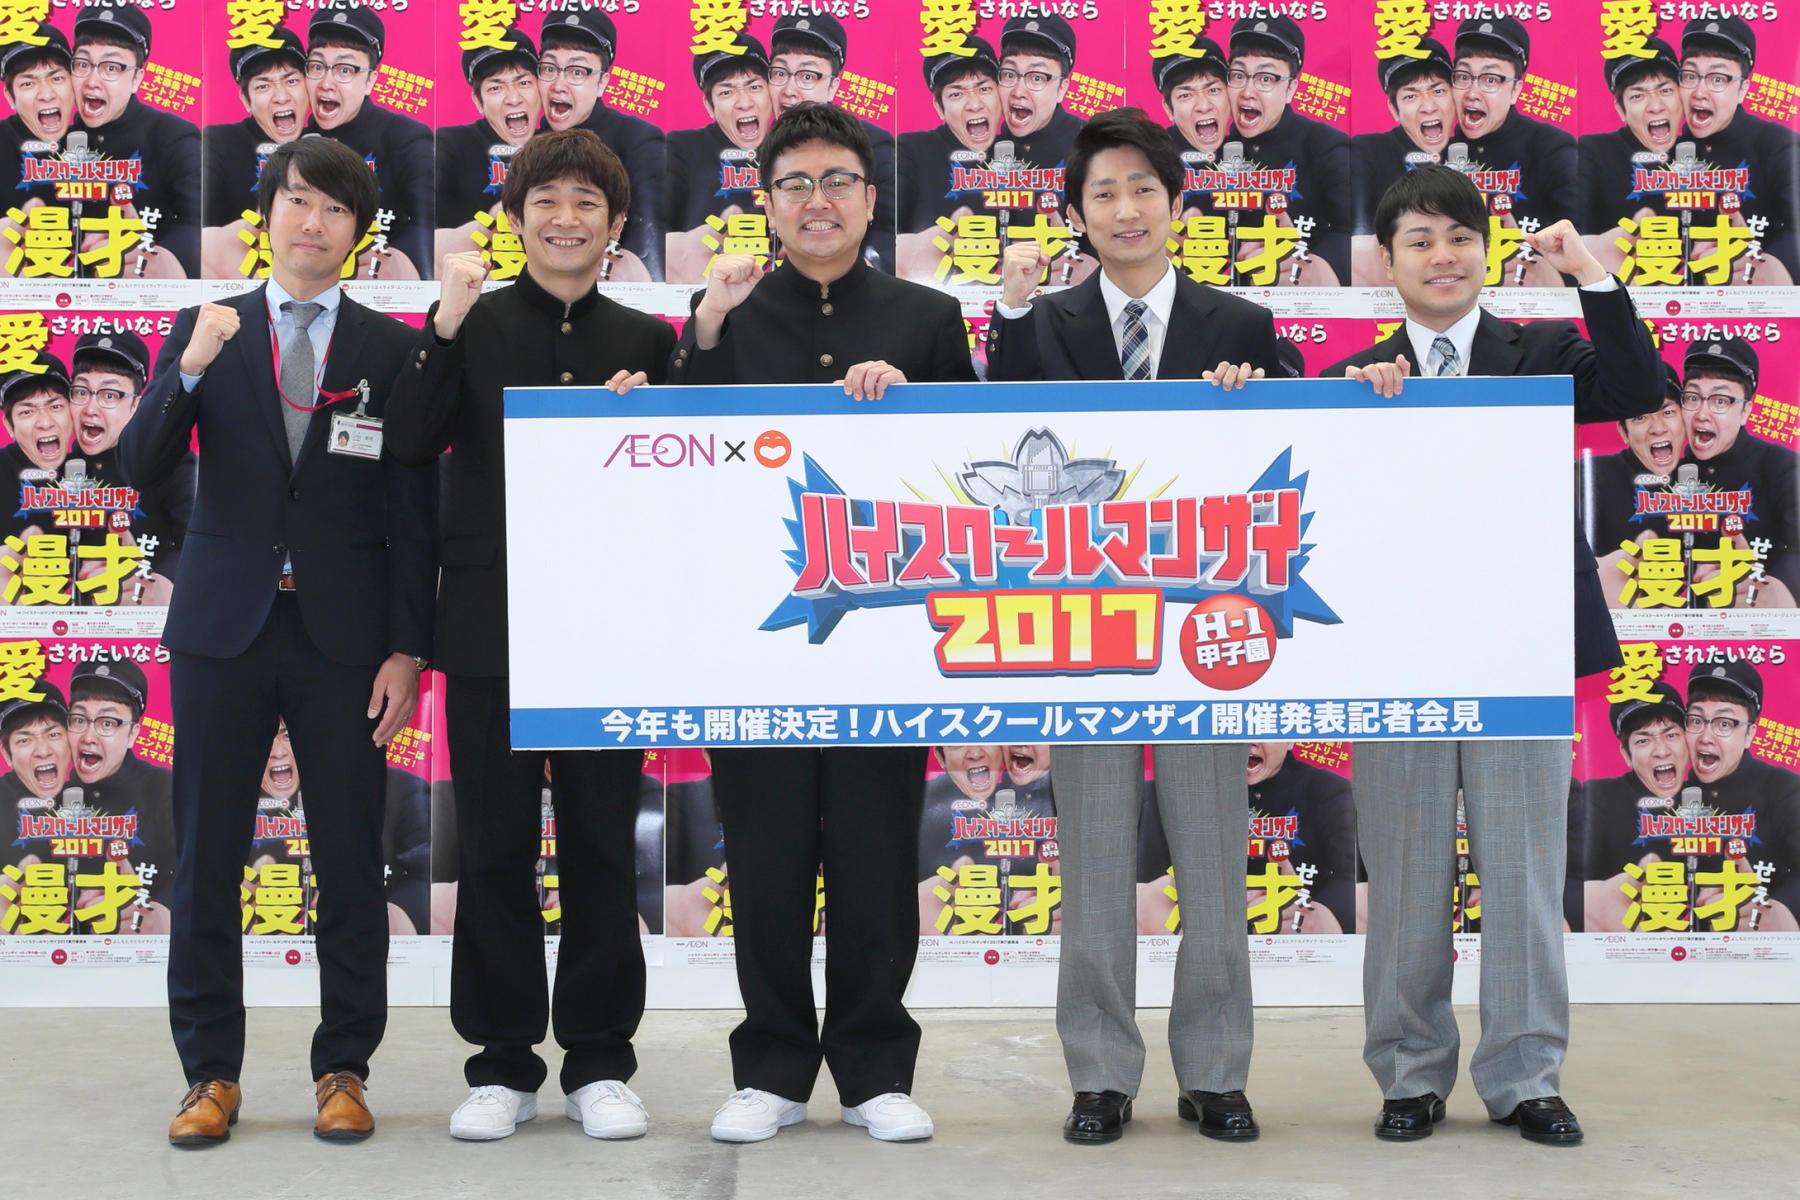 http://news.yoshimoto.co.jp/20170413154336-78ae30fd72f59884f30f6b020435a43127849e73.jpg